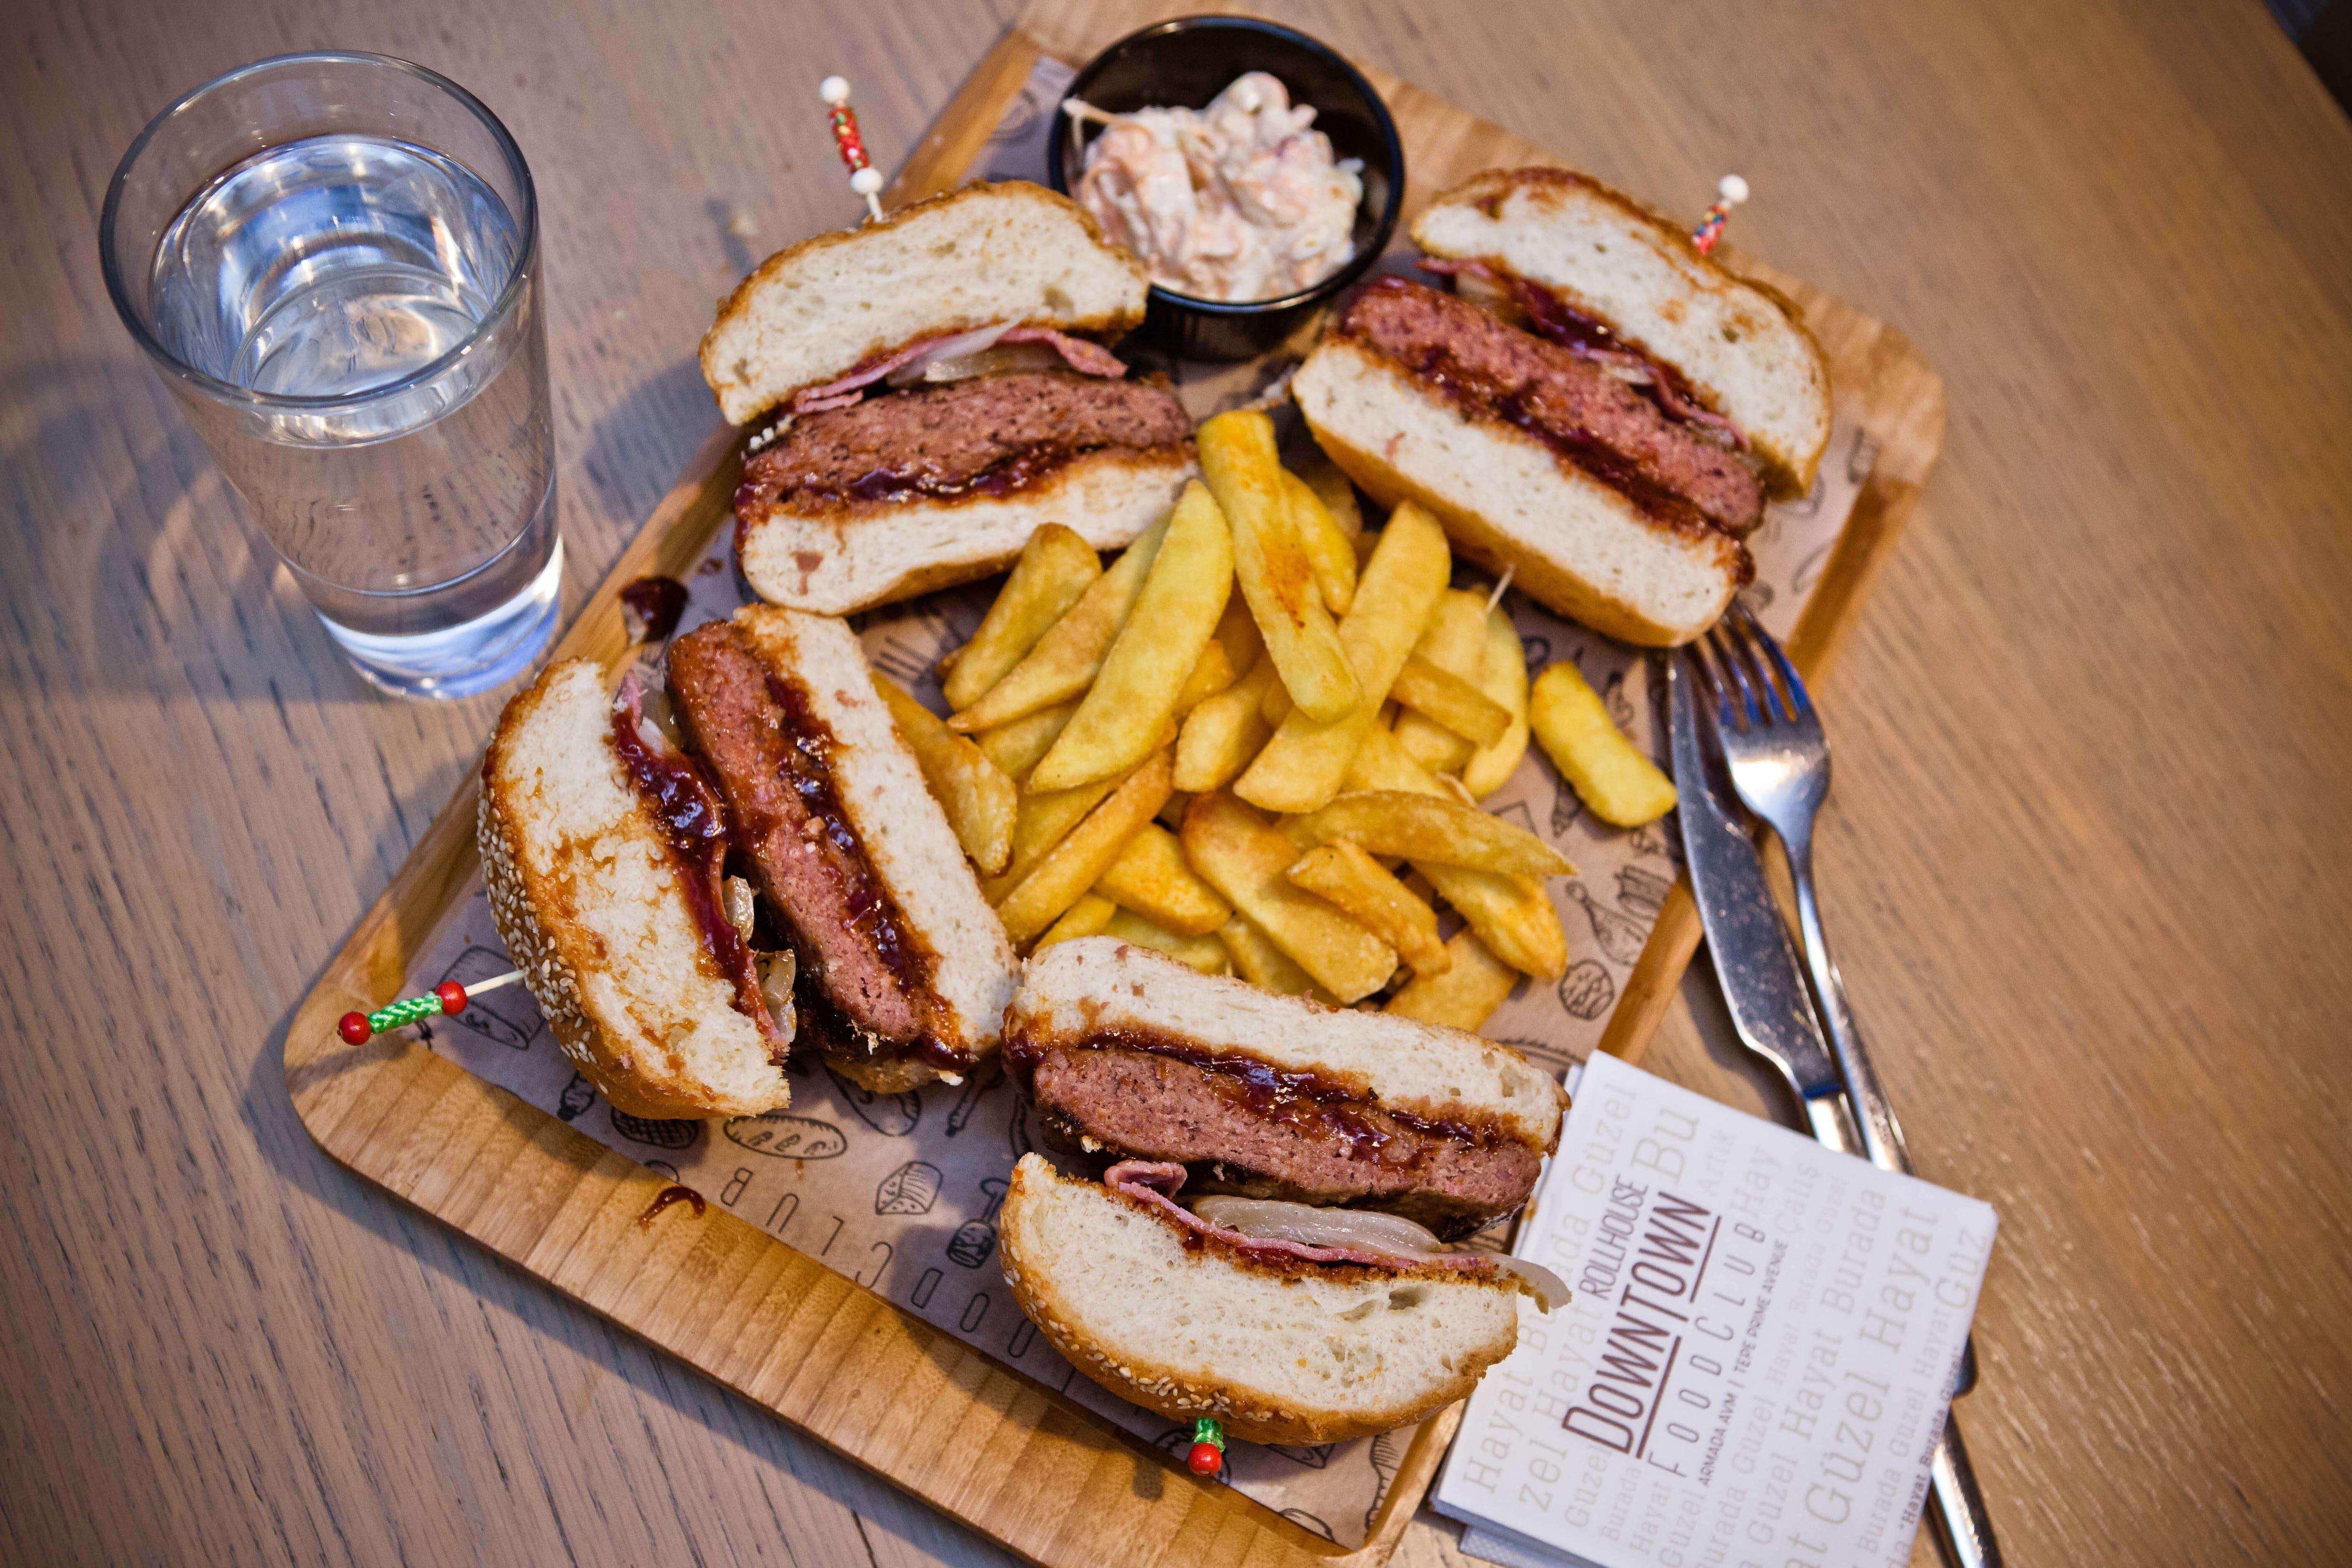 Downtown Food Club